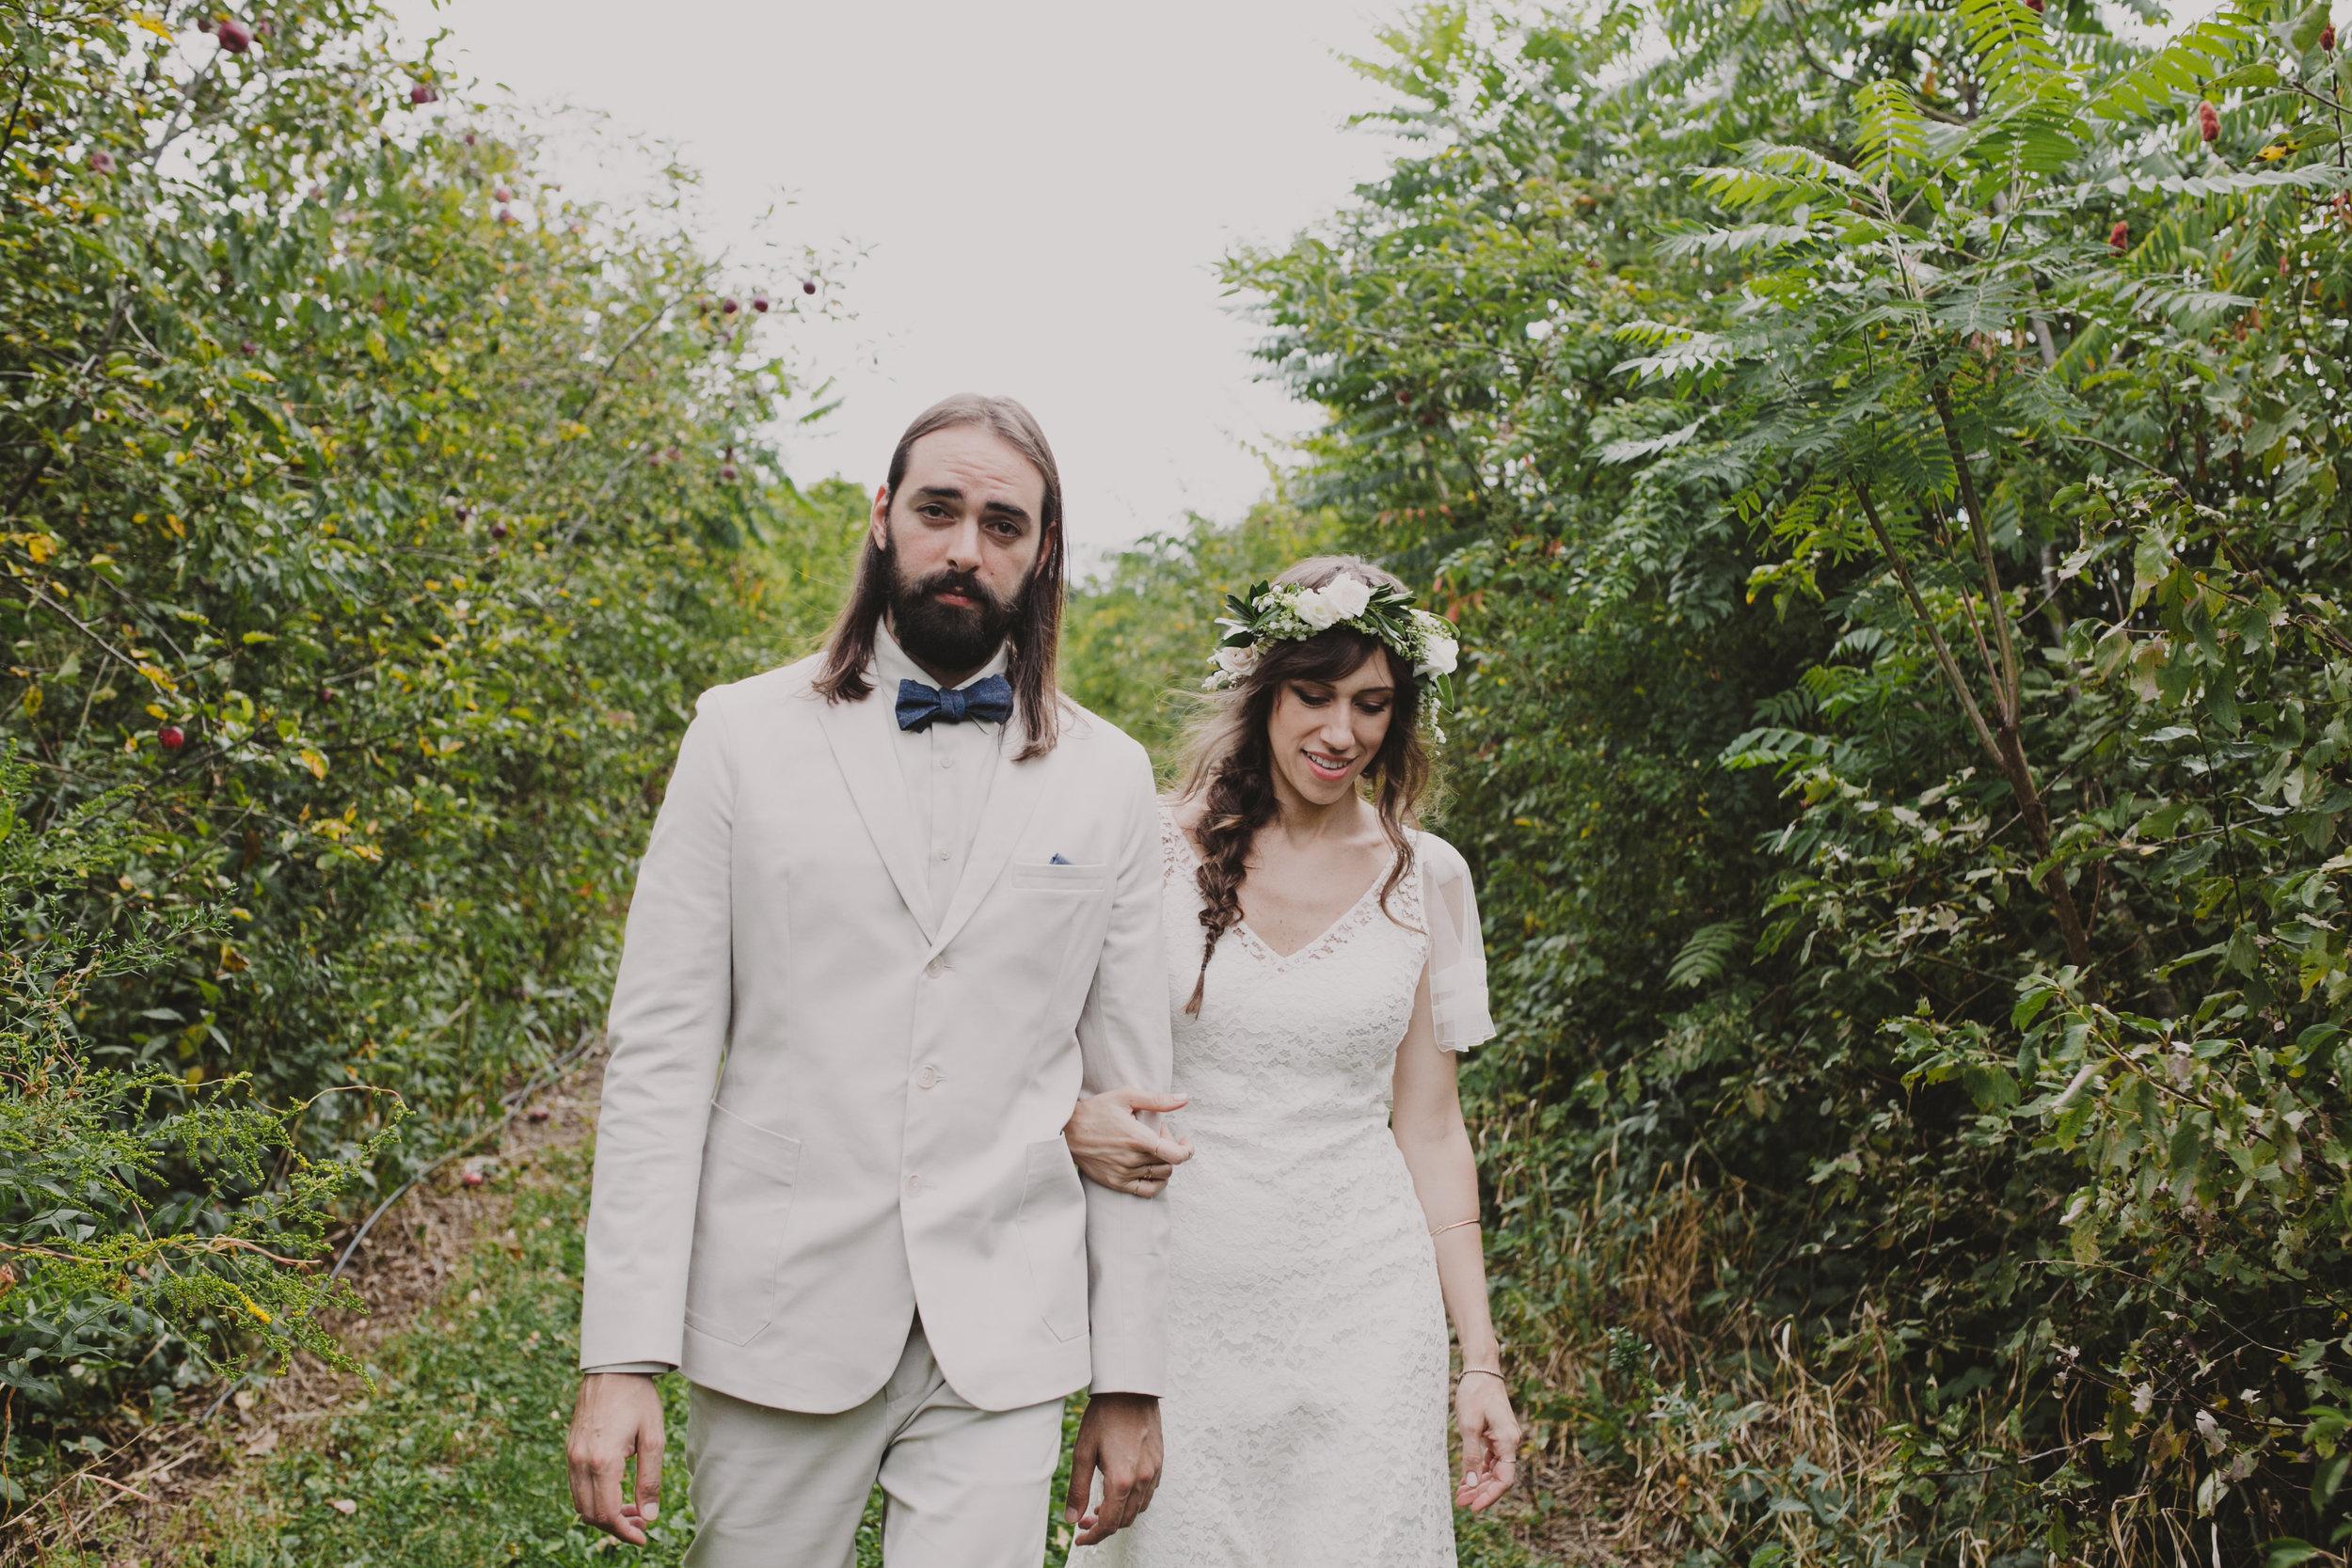 LIBERTY_VIEW_FARM_HIGHLAND_NY_WEDDING_CHELLISE_MICHAEL_PHOTOGRAPHY791.JPG